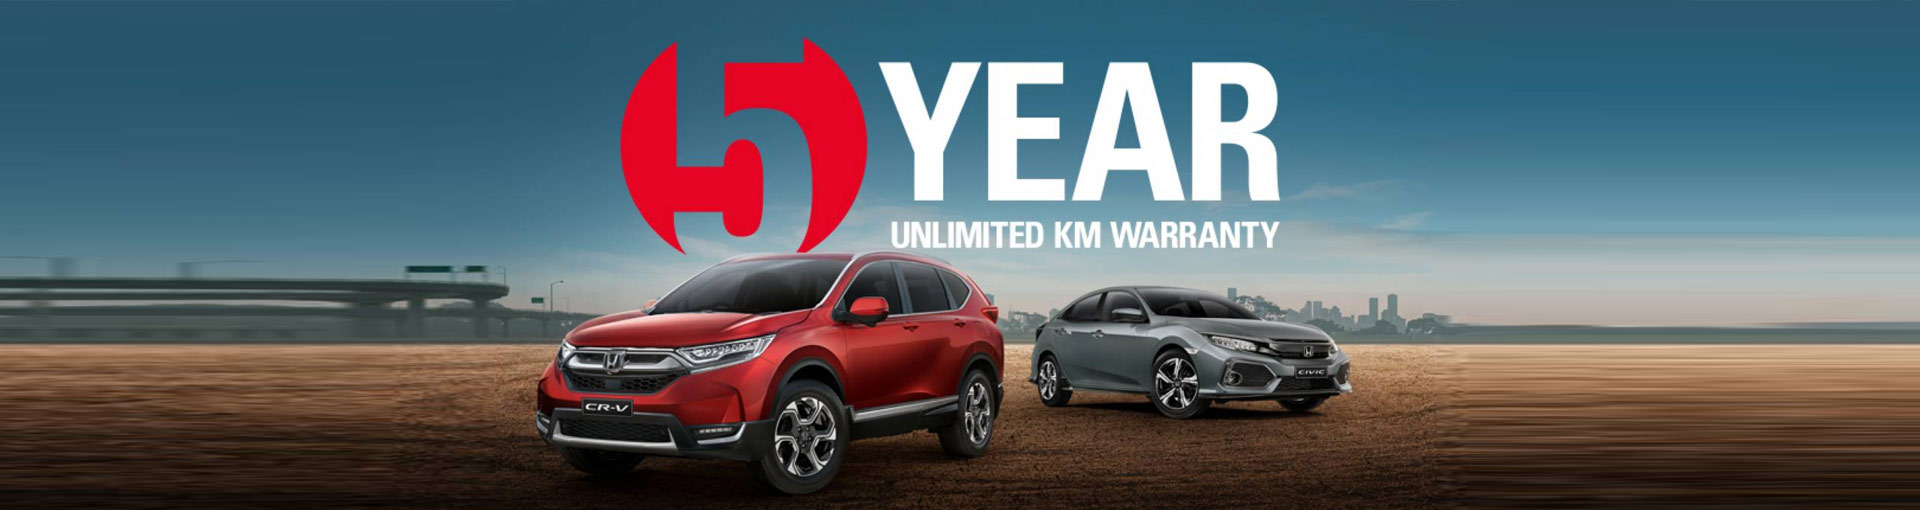 Hunter Honda announces upgraded warranty across all new cars